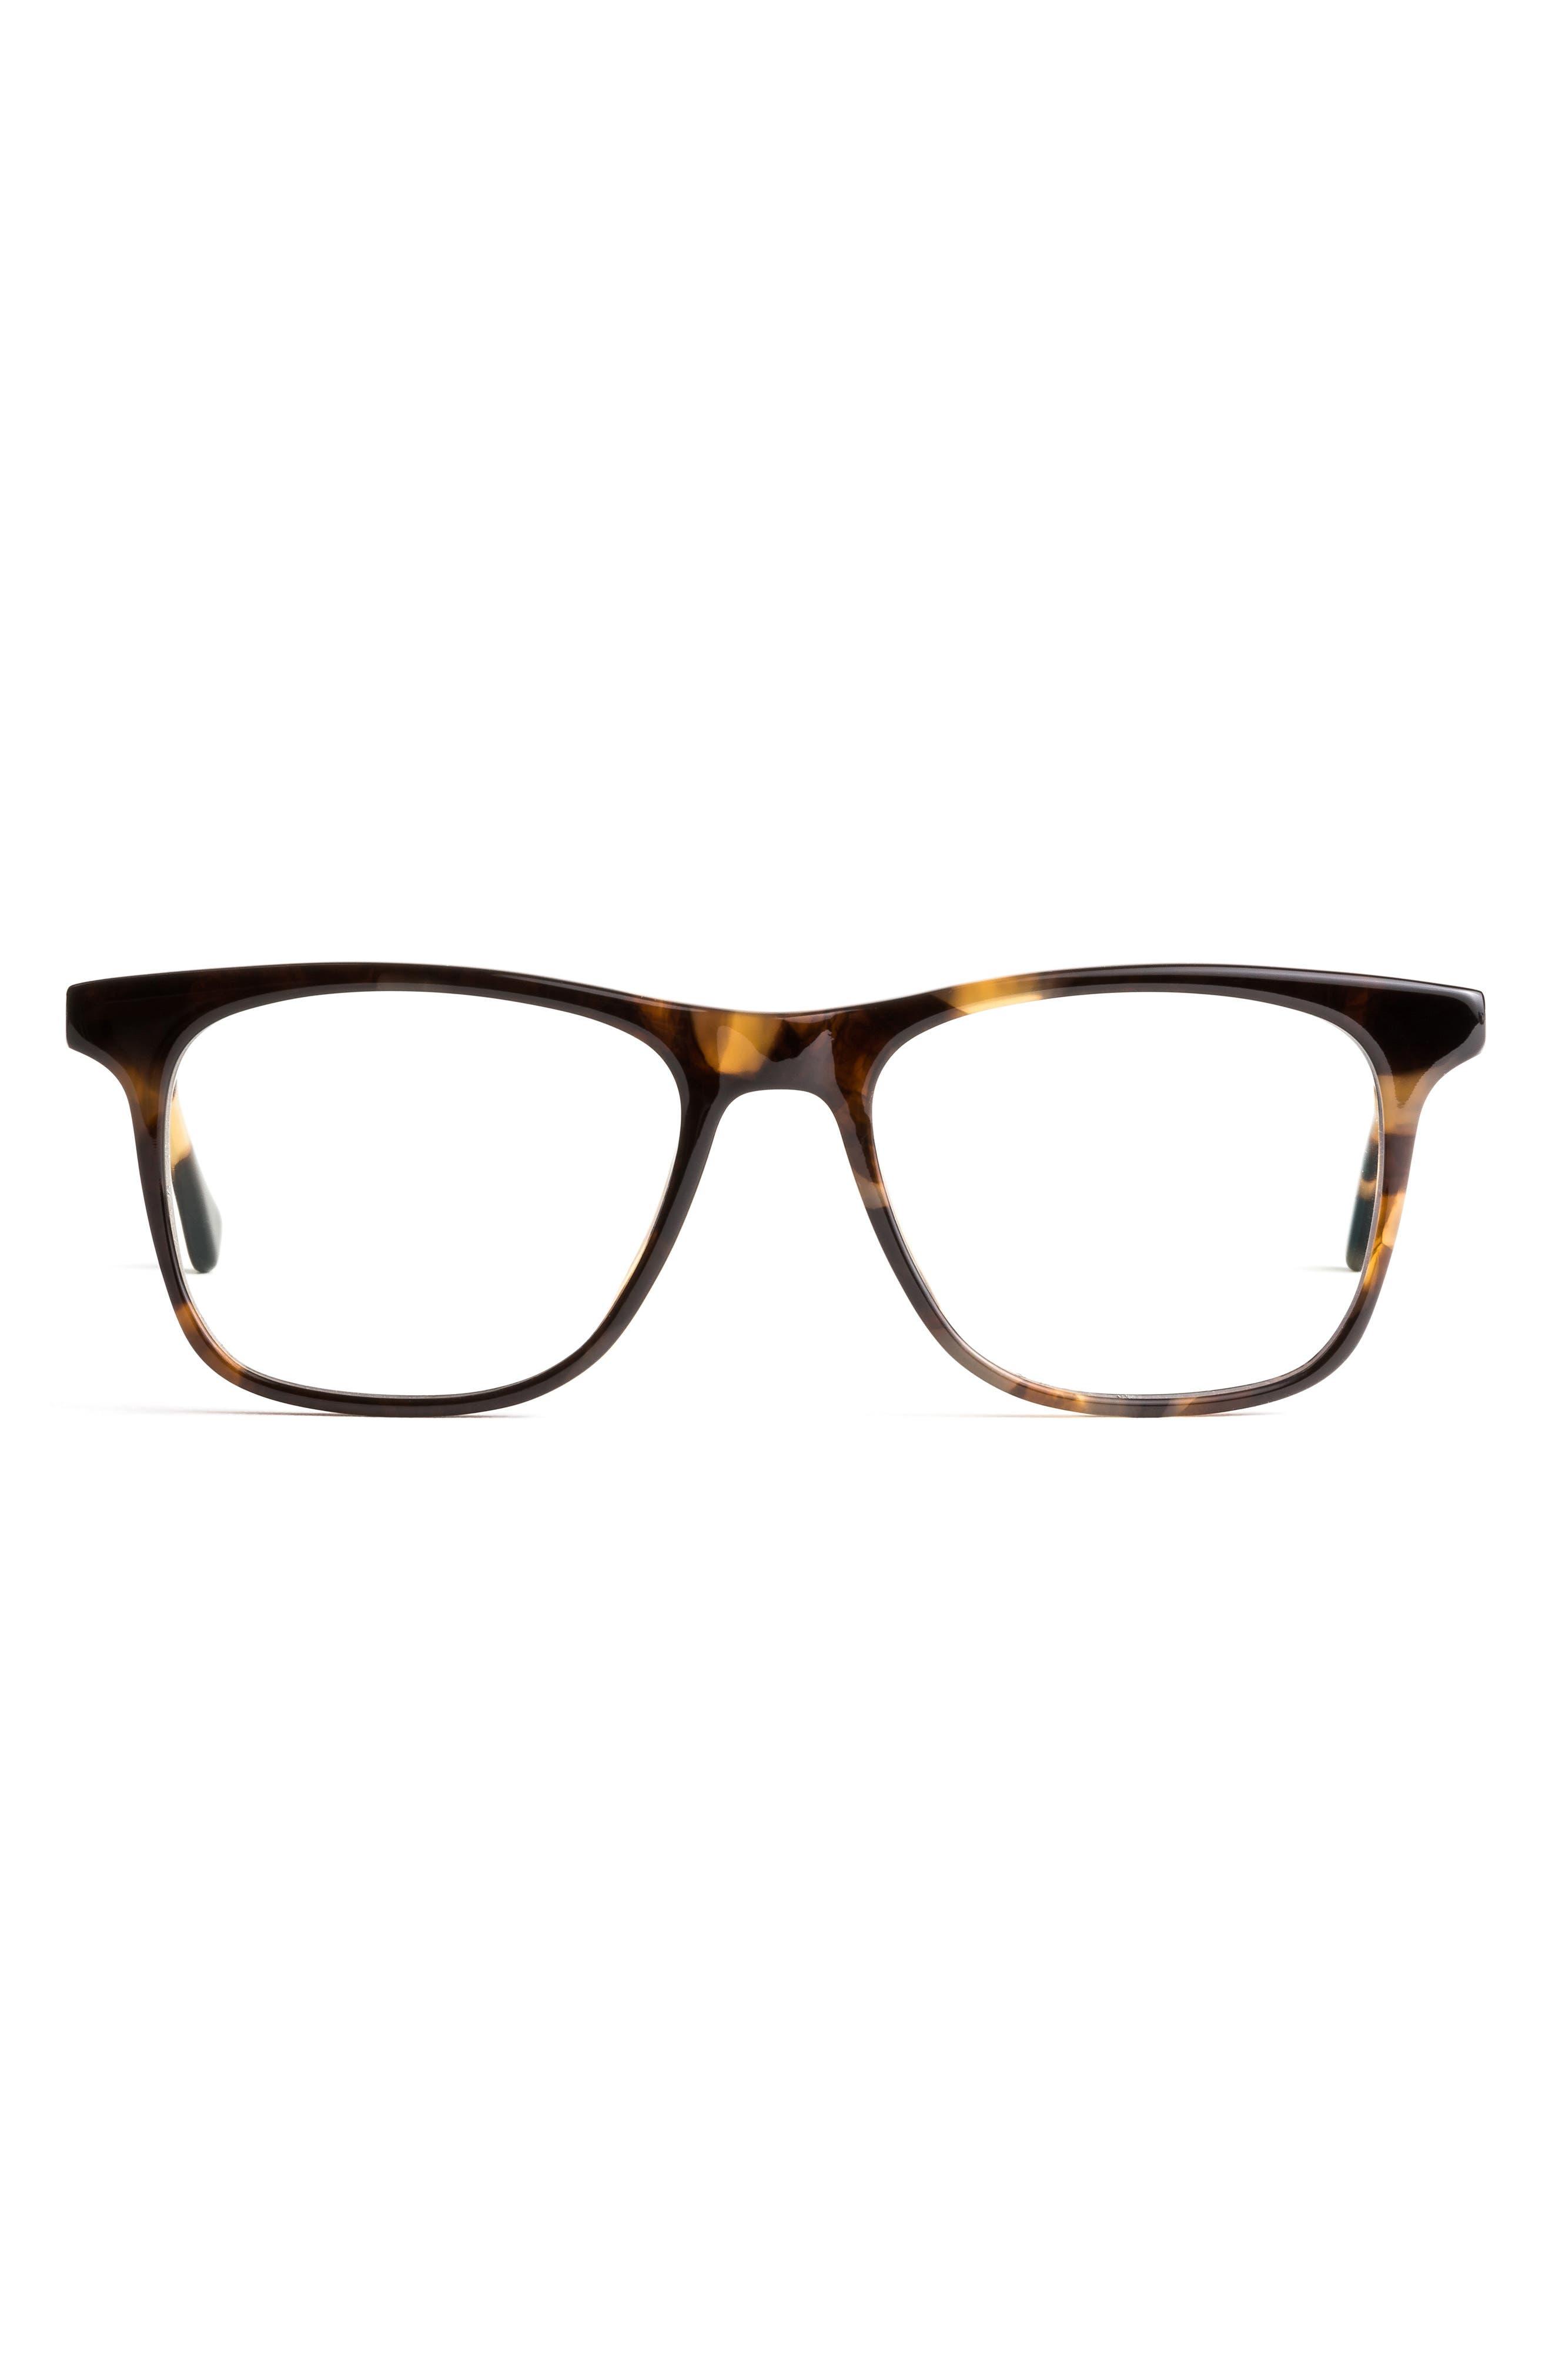 Jemison 52mm Square Blue Light Blocking Glasses